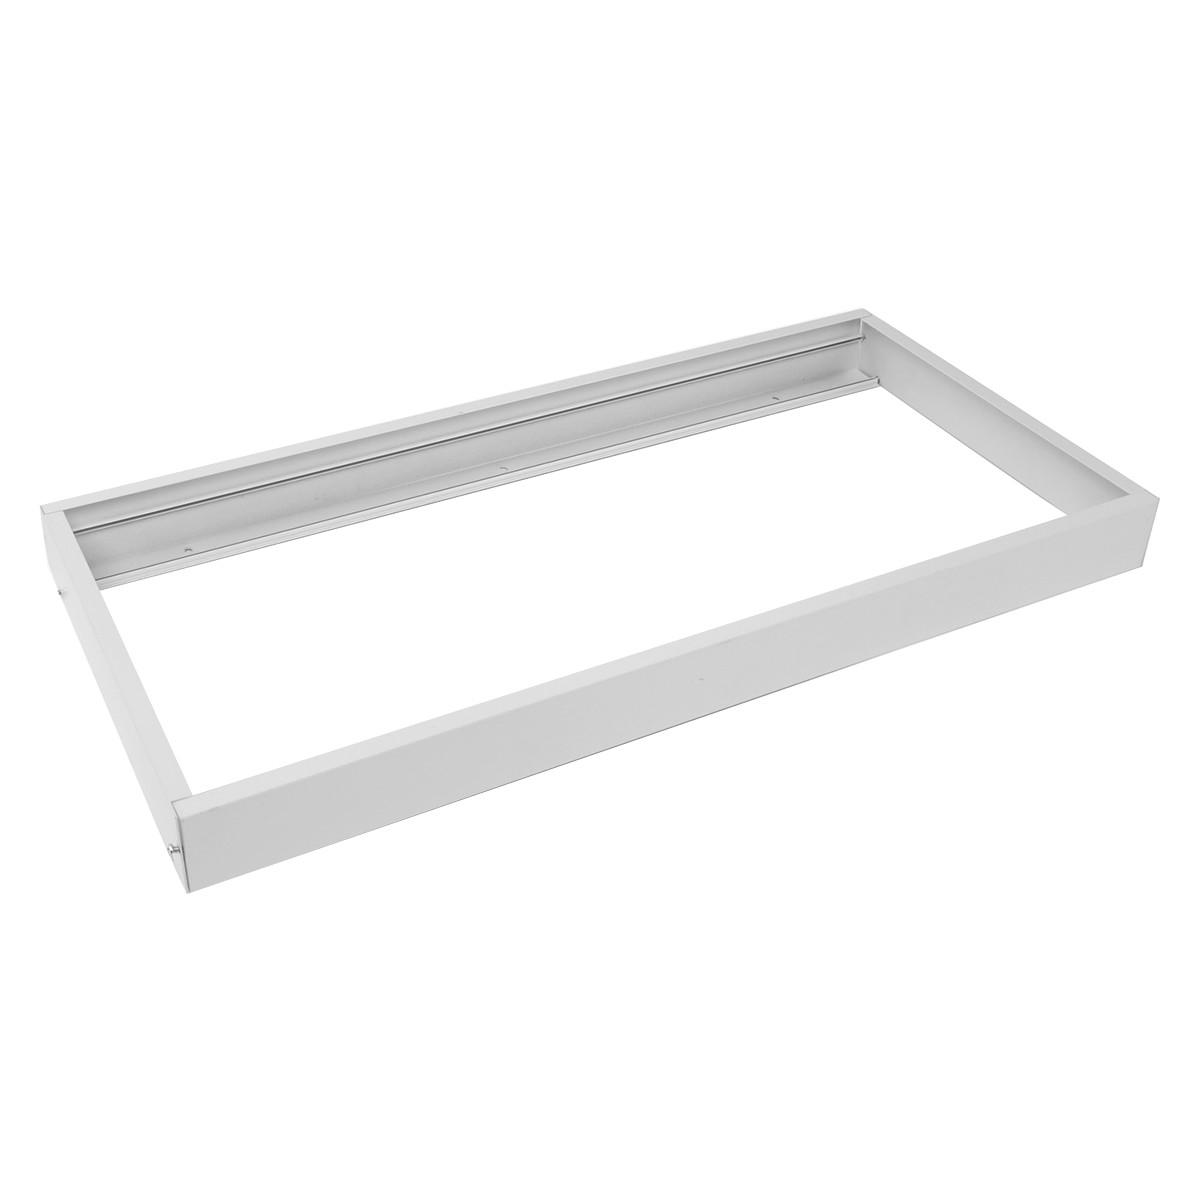 LED Paneel 30x60 - Aigi - Opbouw Frame - Aluminium - Wit